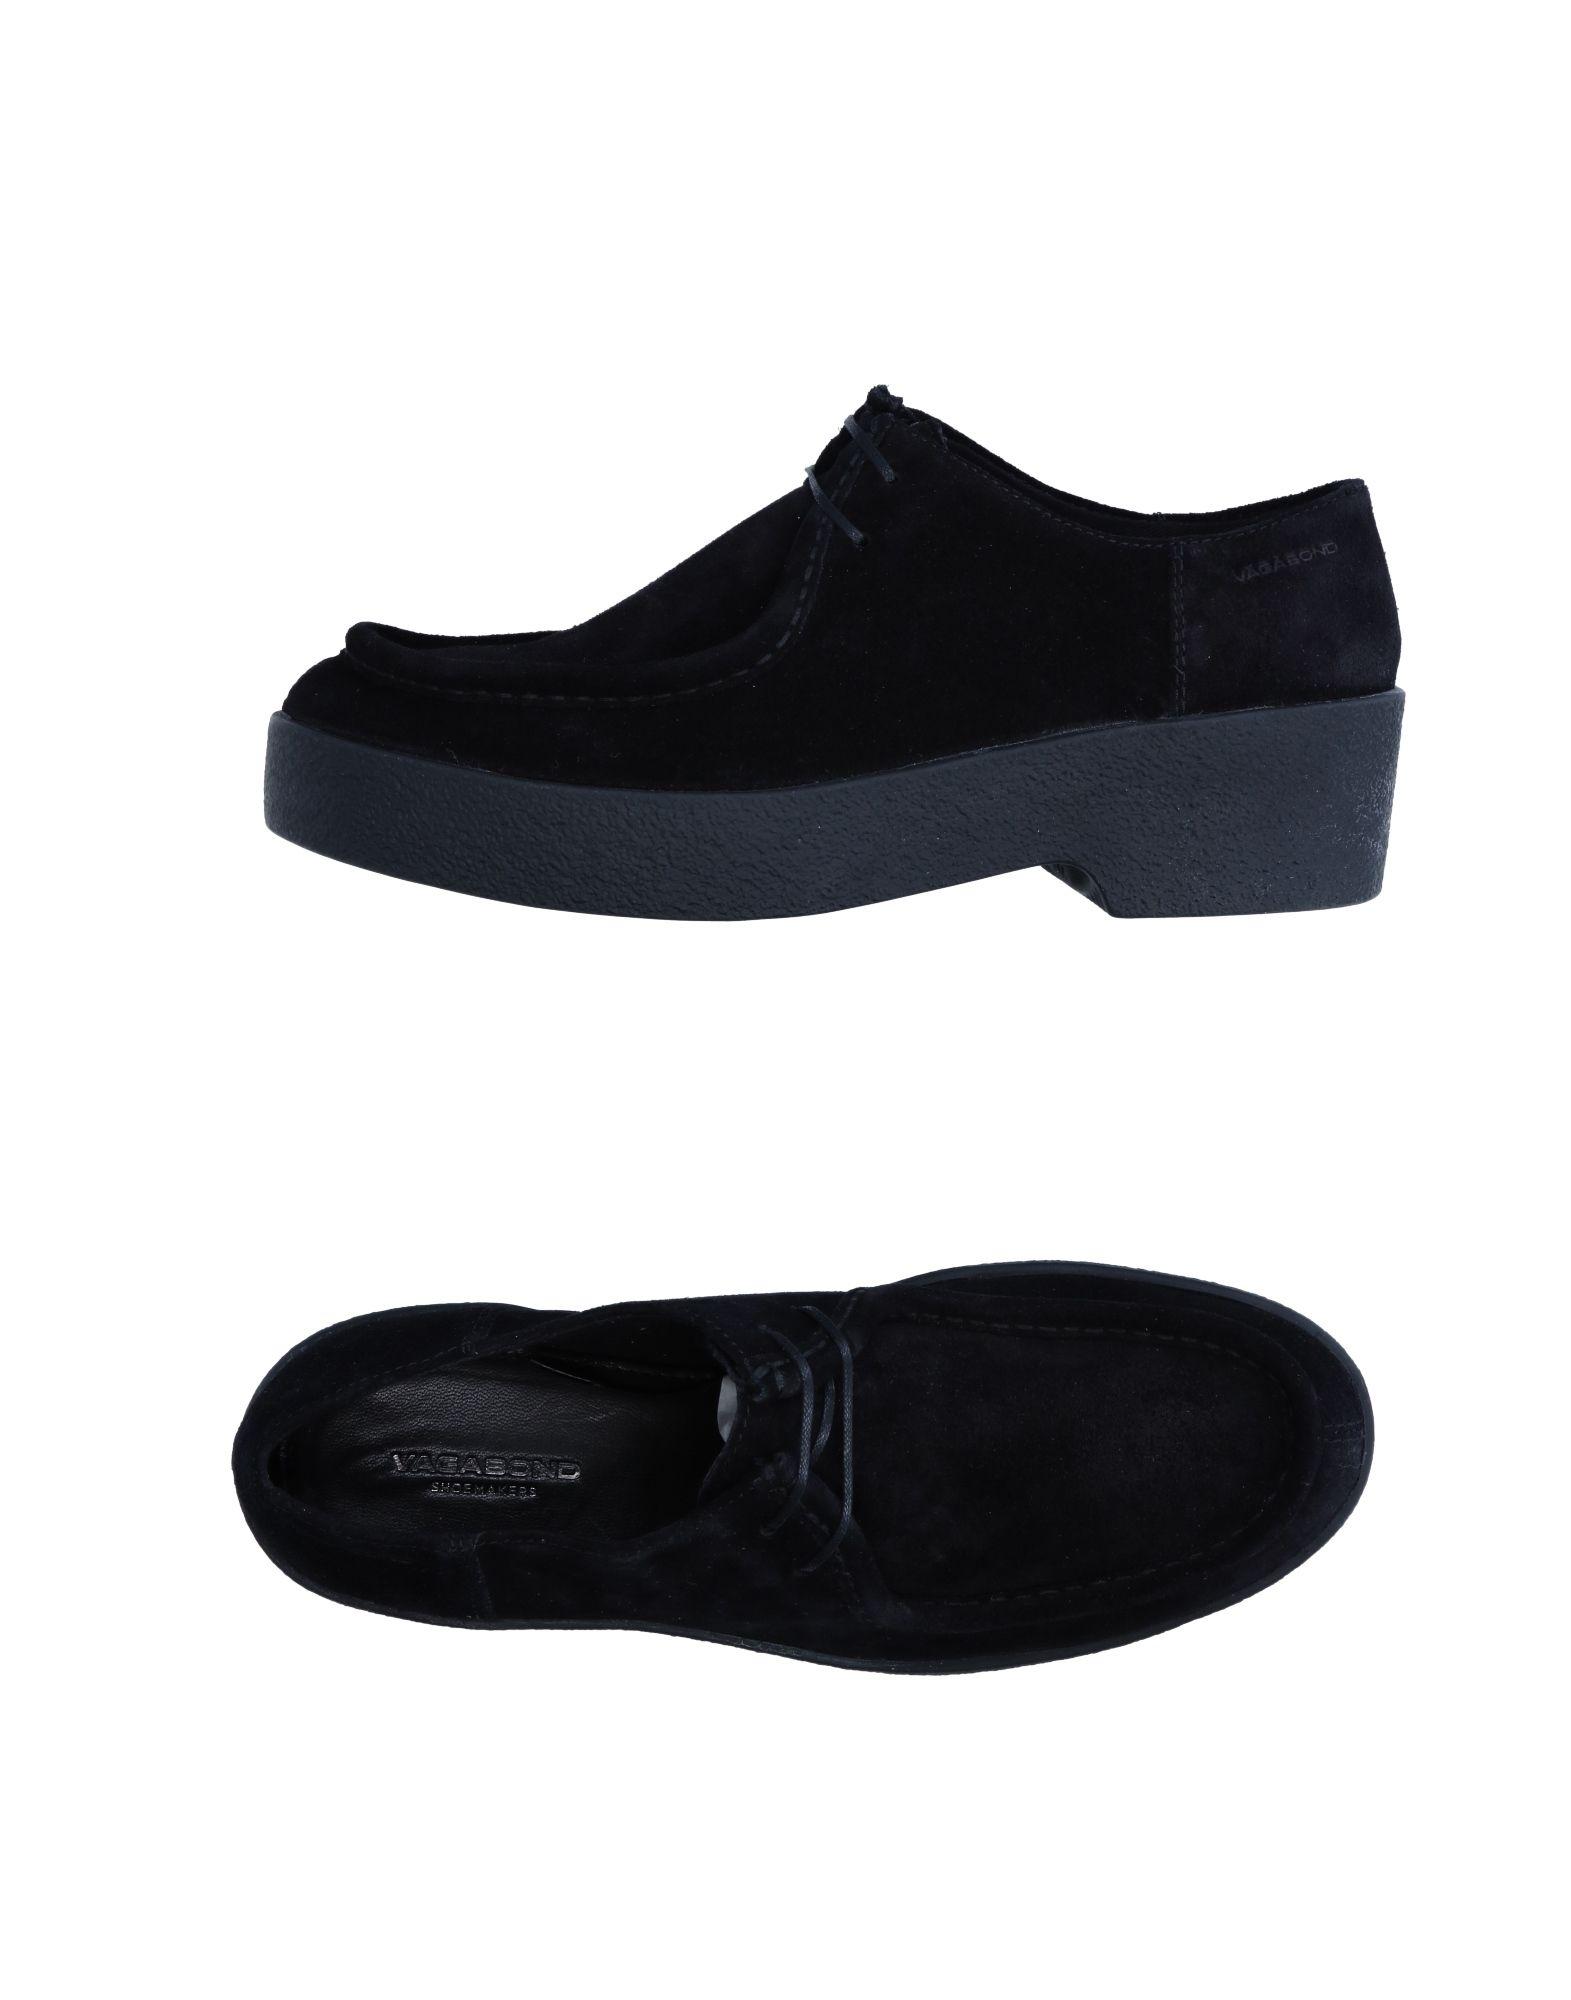 Vagabond Shoemakers Schnürschuhe Damen  11268203WL Gute Qualität beliebte Schuhe Schuhe beliebte 8dbd6c